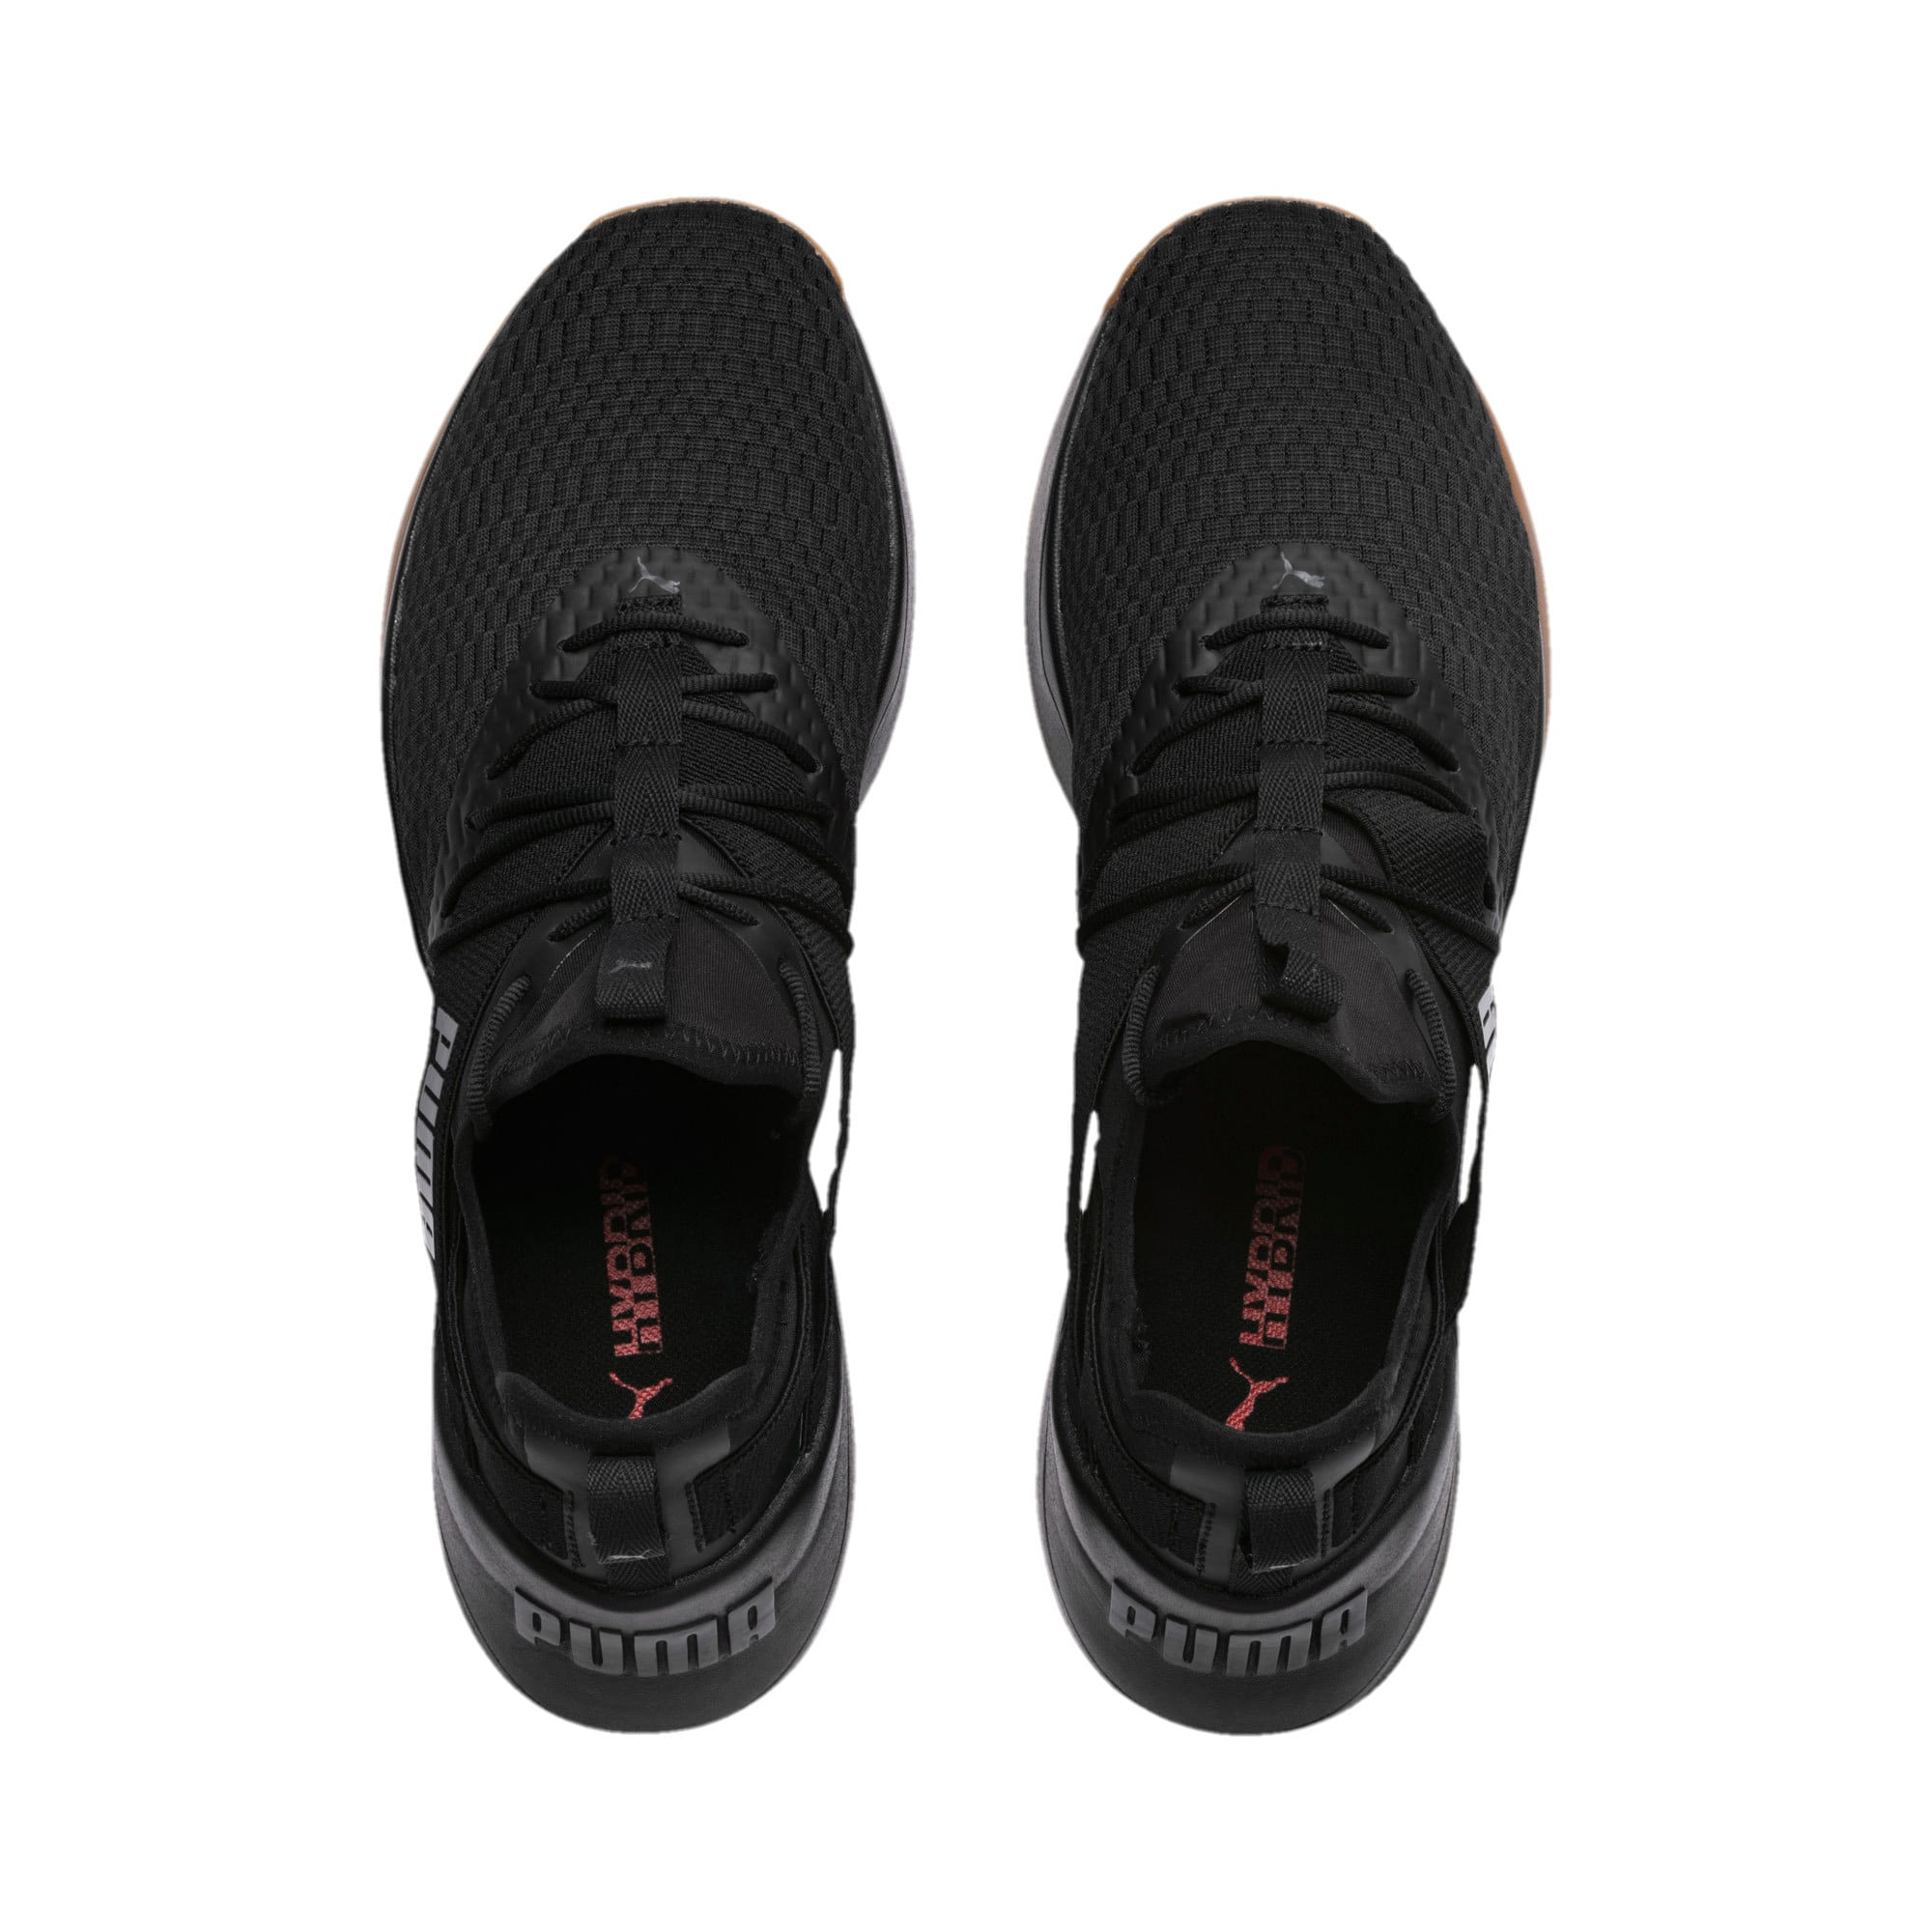 Thumbnail 6 of Jaab XT Summer Herren Sneaker, Puma Black-Asphalt, medium